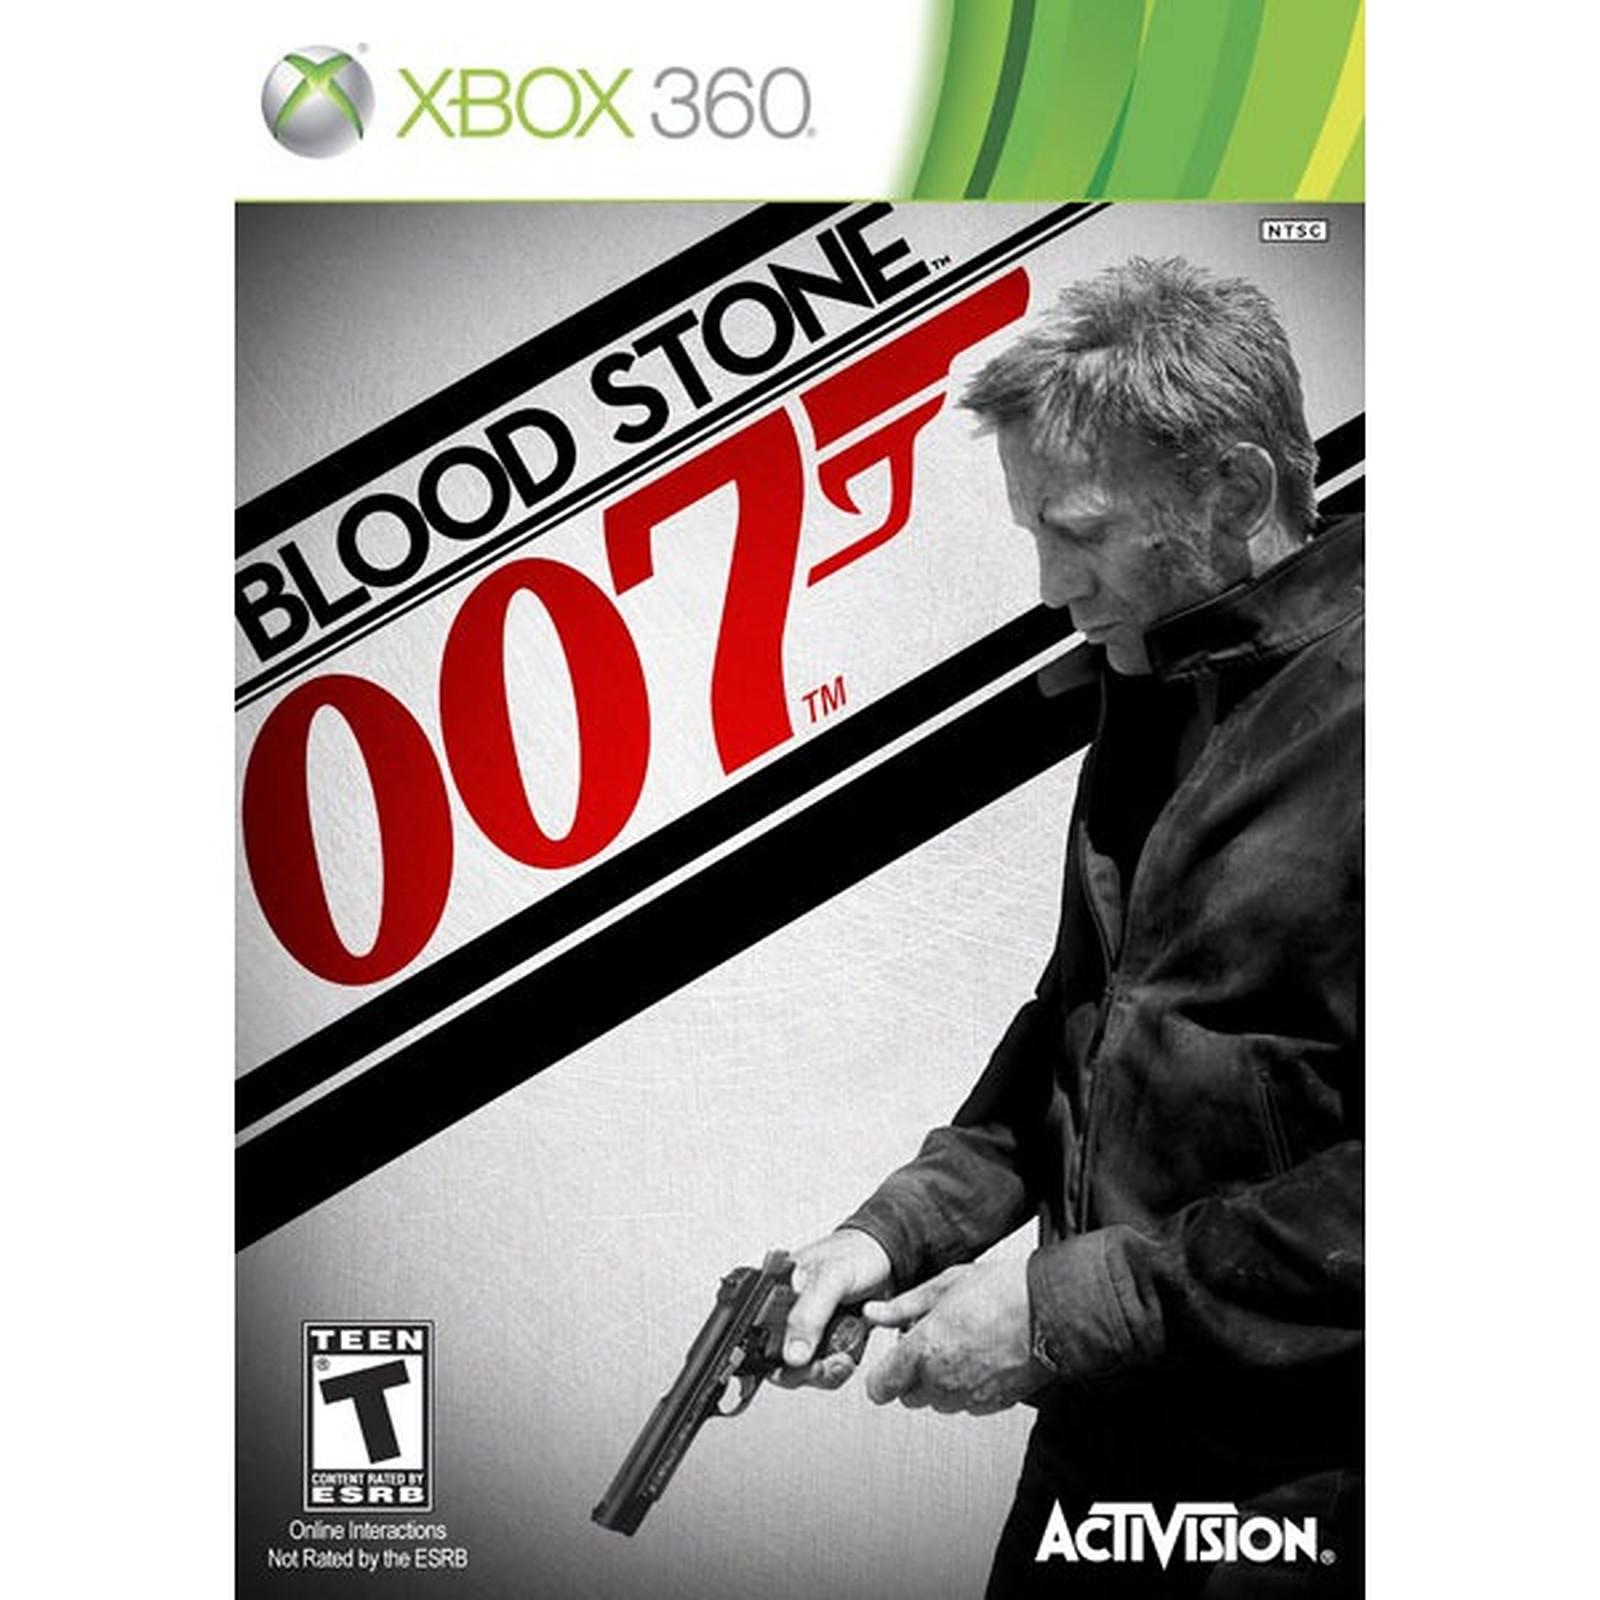 James Bond 007 : Blood Stone (Xbox 360)